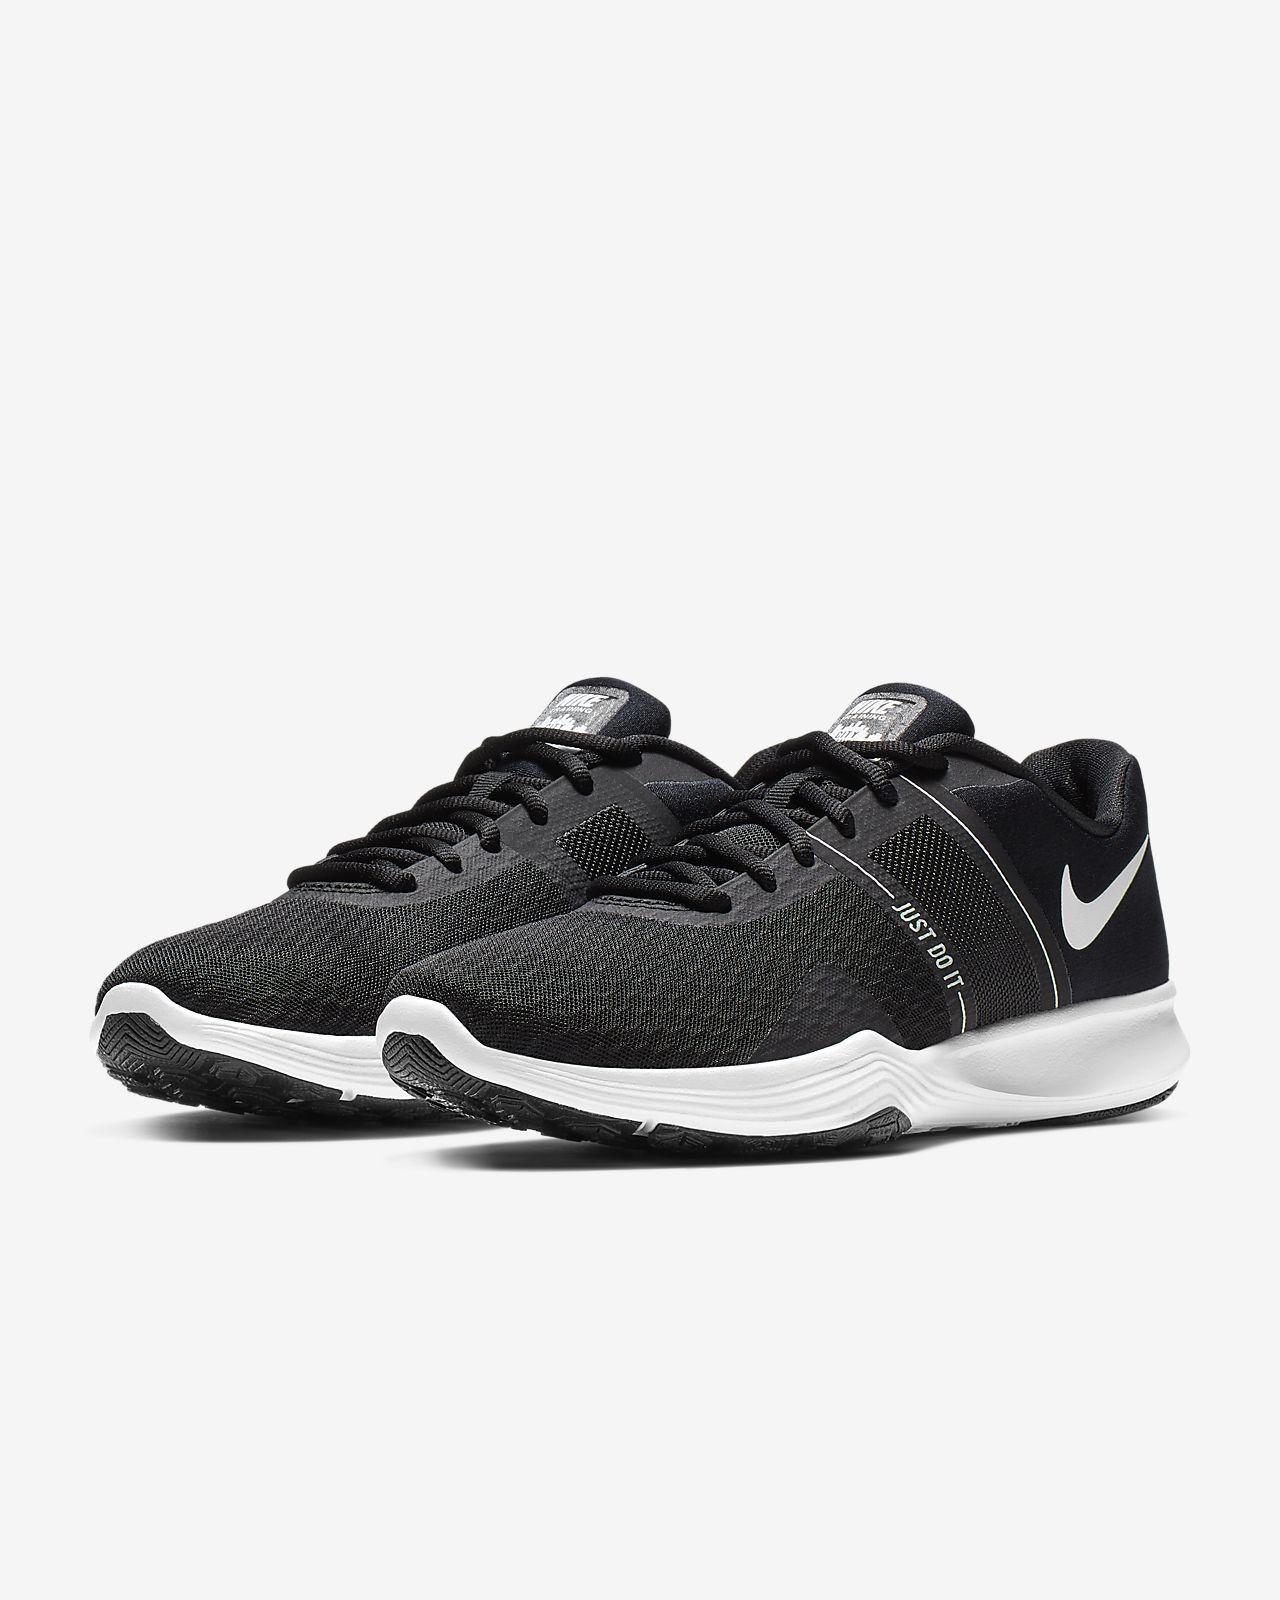 City Chaussure Training Nike 2 De Pour Femme Trainer 8O0nwkXP